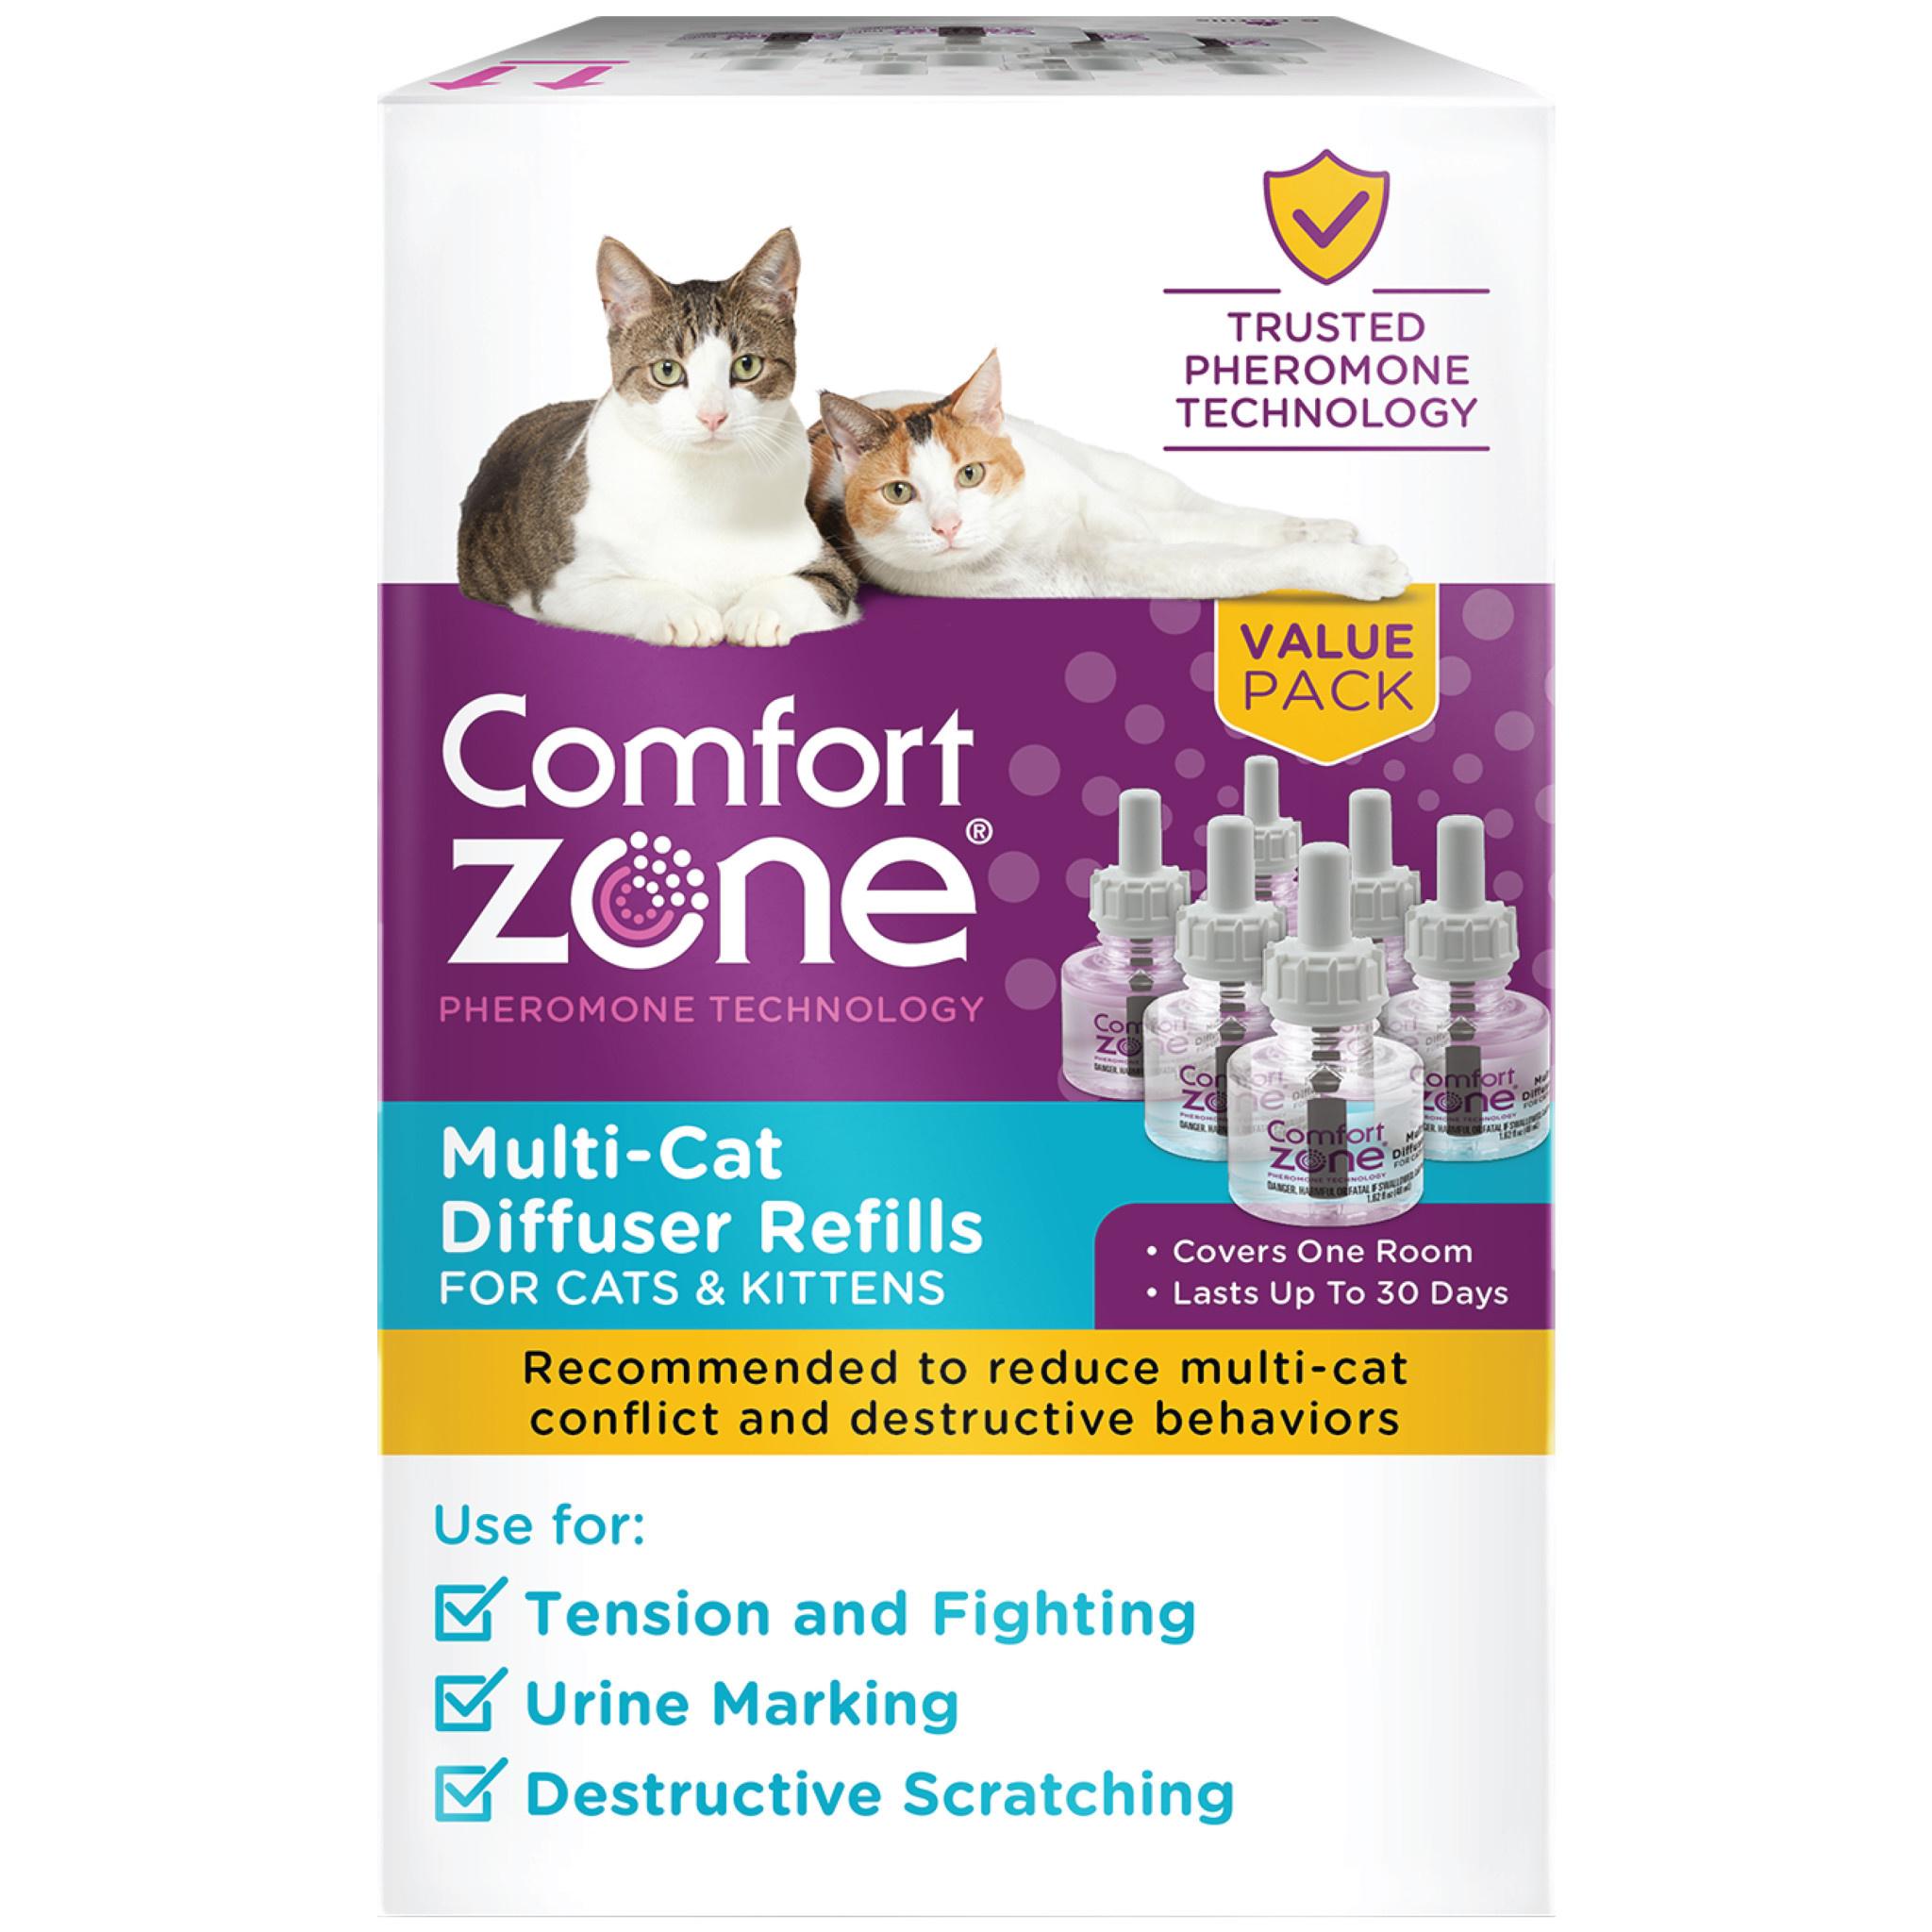 Comfort Zone Two Room Multi-Cat Diffuser